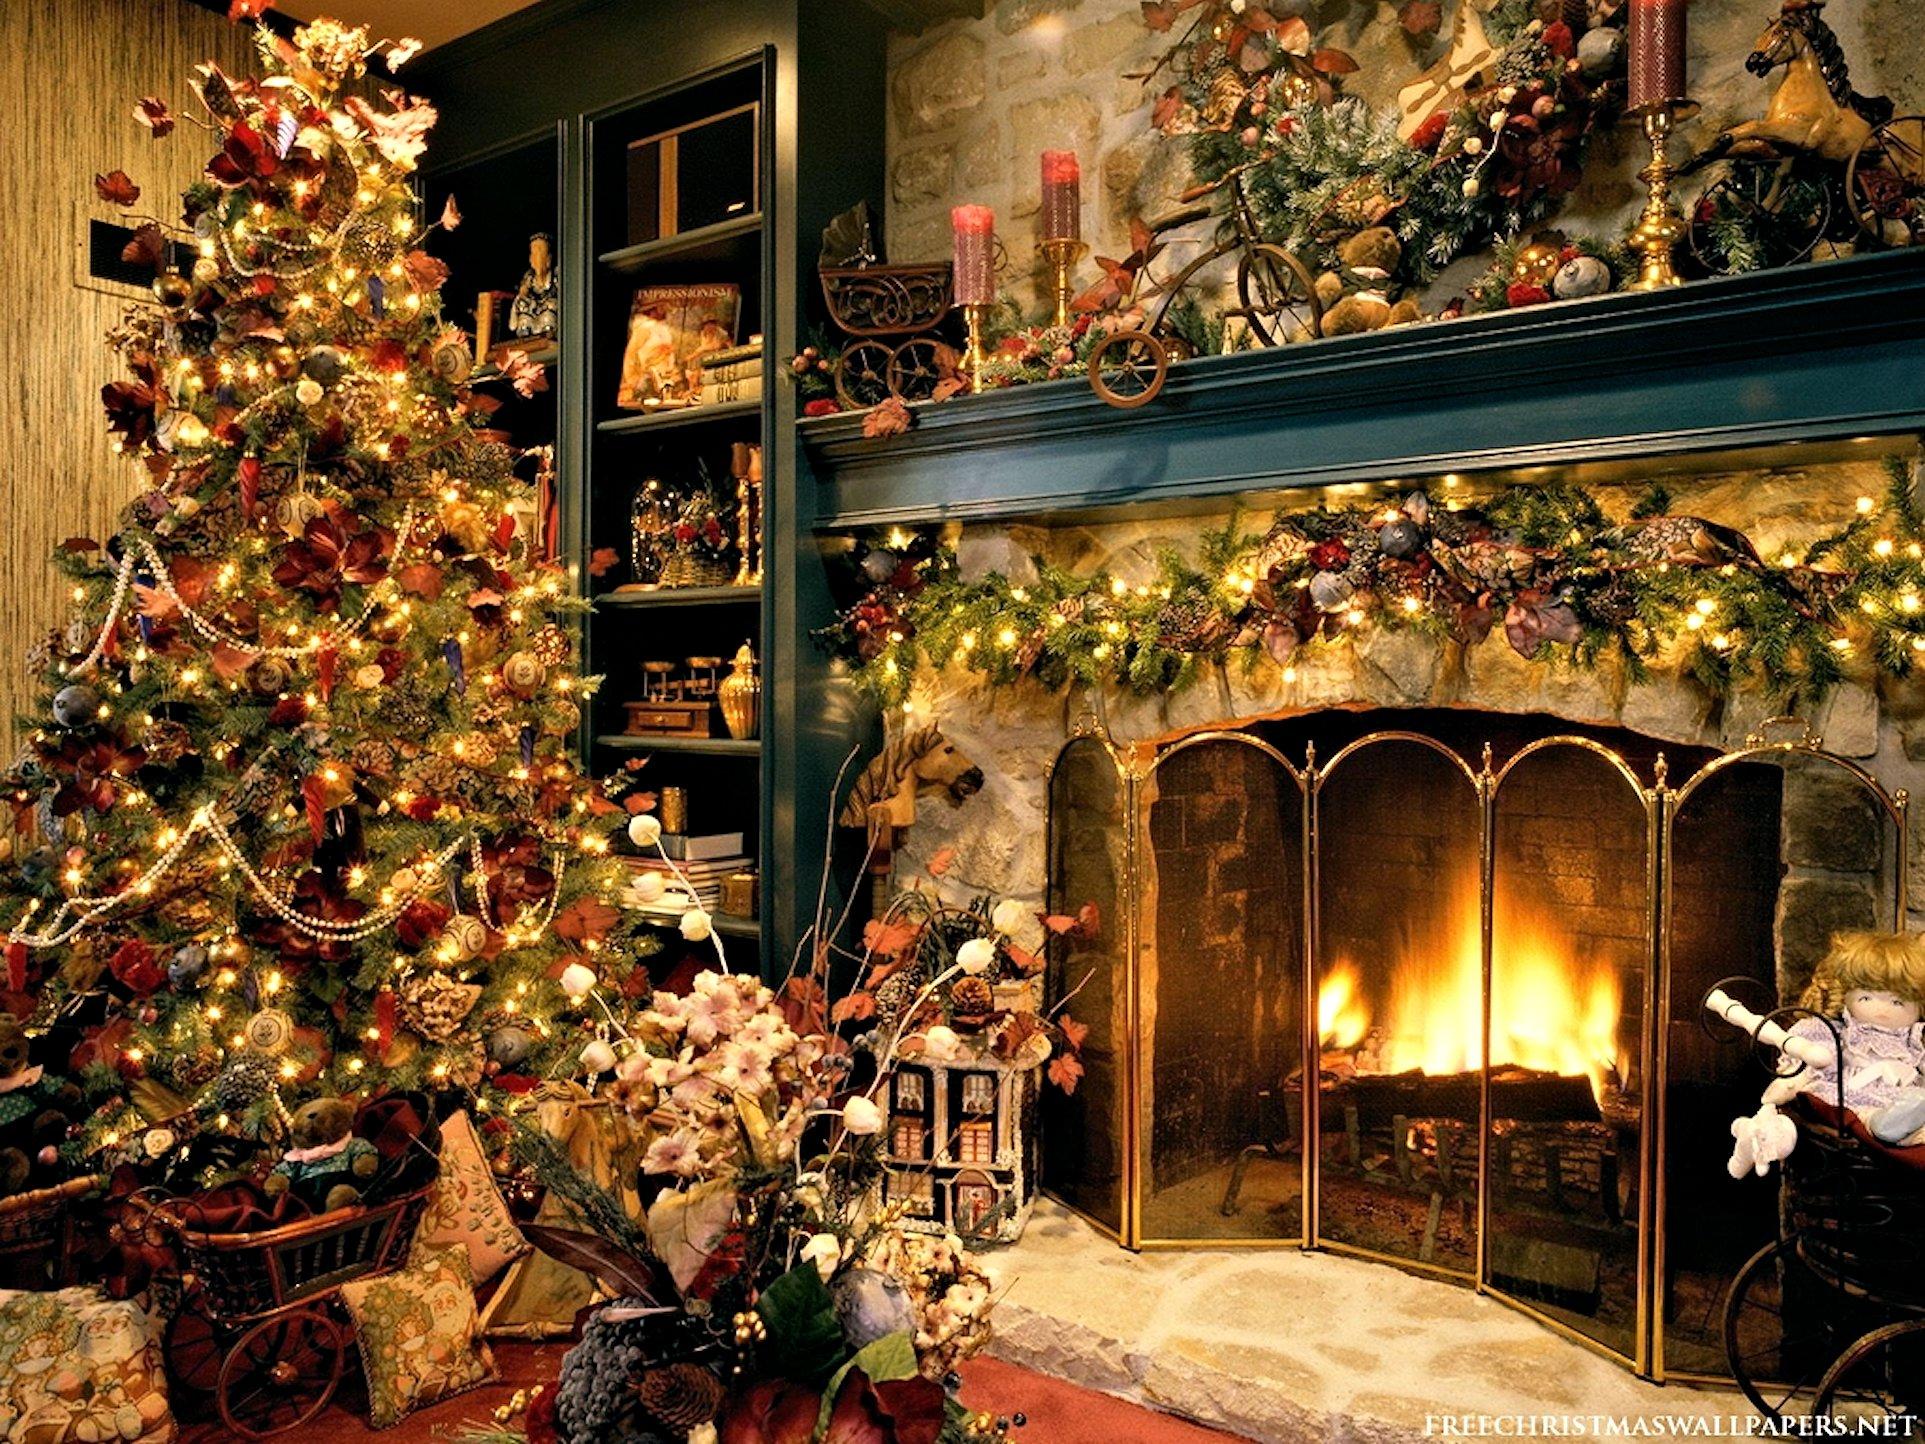 Fireplace 1024 127315 Desktop Wallpapers Wallpapers 1925x1444